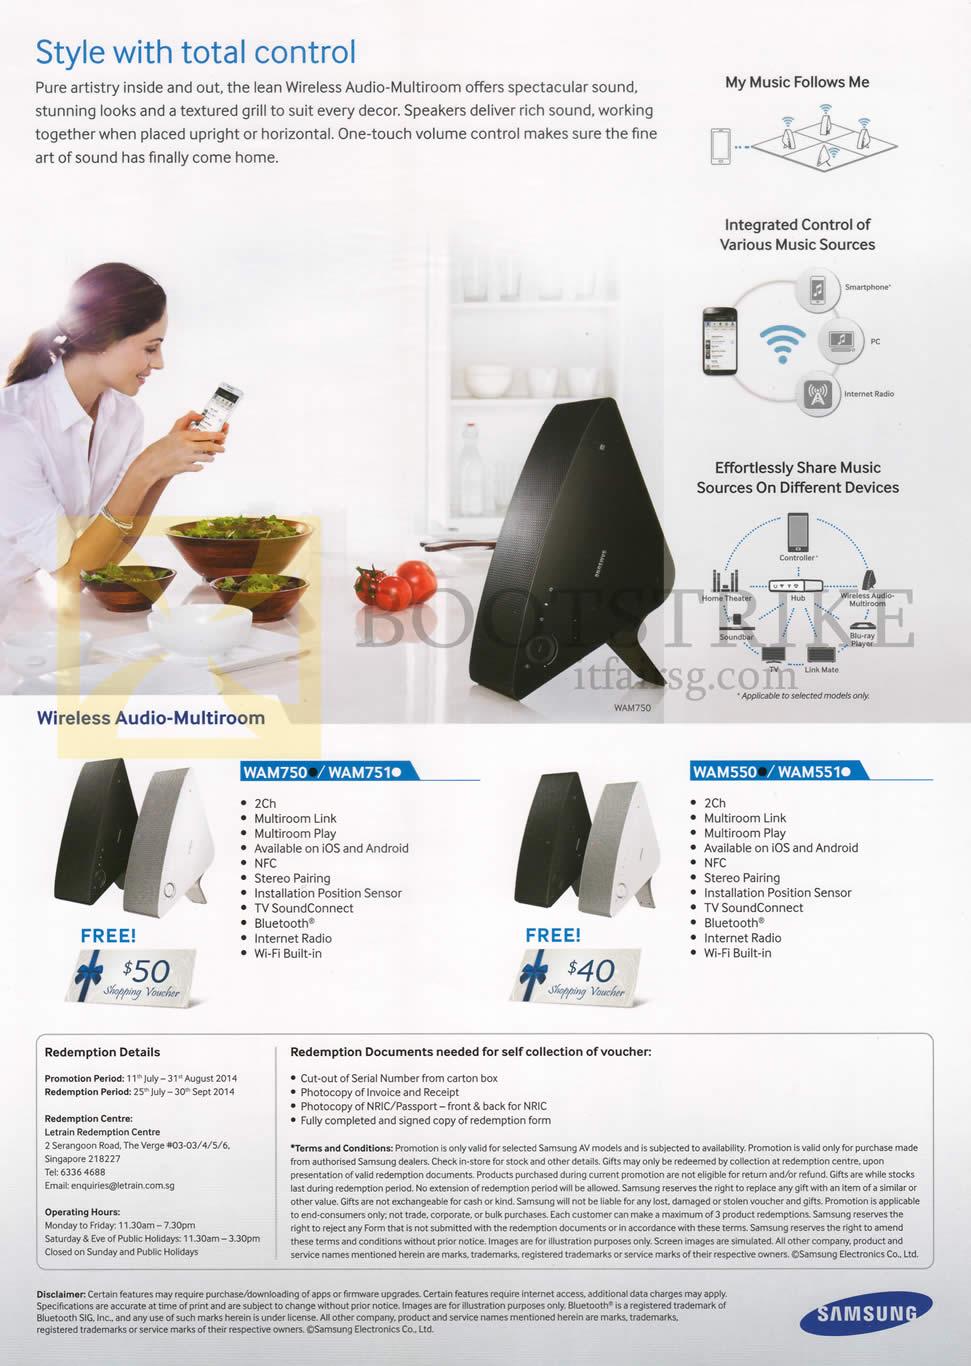 COMEX 2014 price list image brochure of Samsung (No Prices) Wireless Audio Multiroom